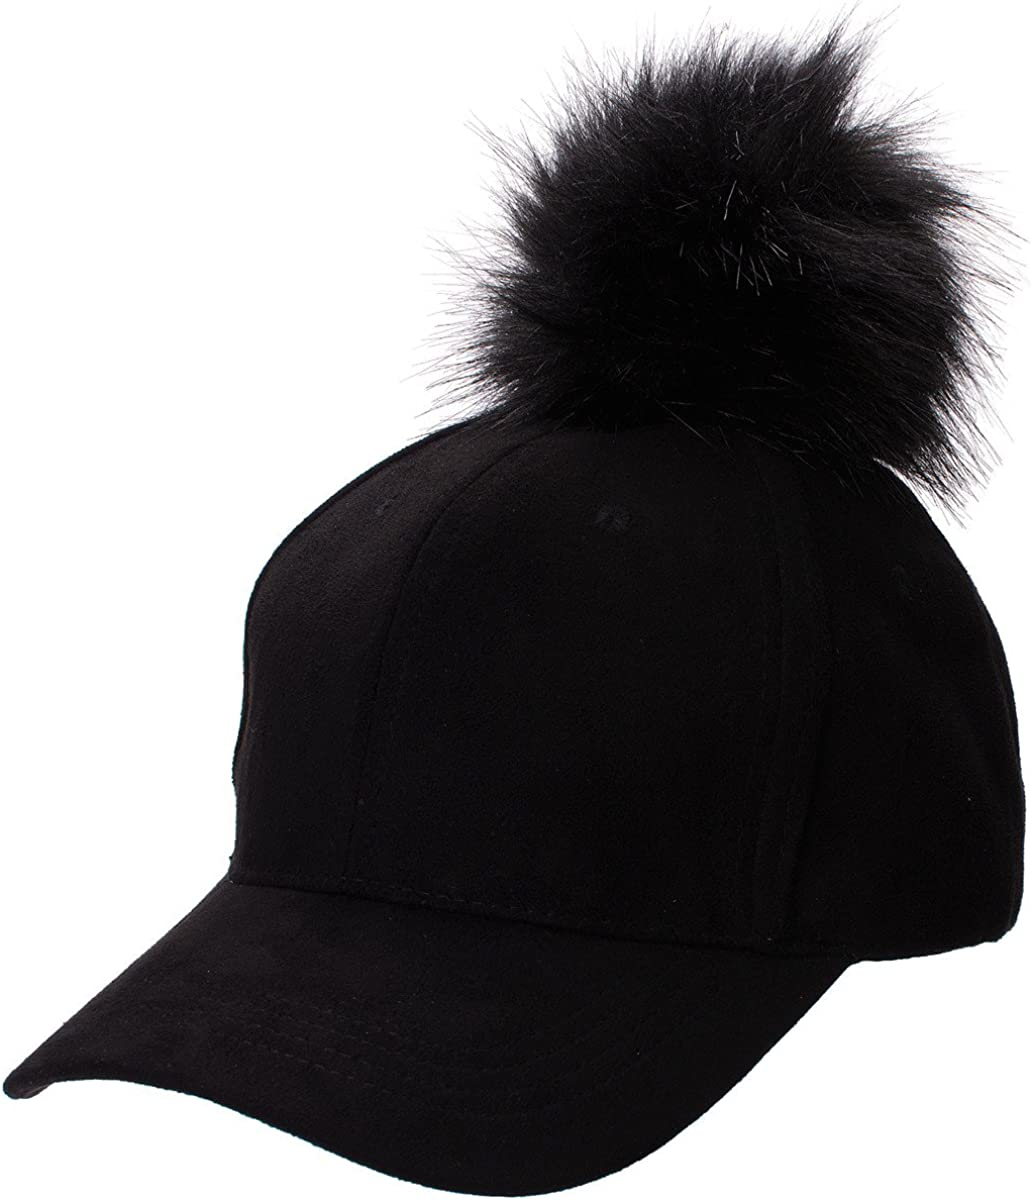 Lawliet Womens Adjustable Suede Baseball Cap Hip-Hop Hat Faux Fur Pom Pom A383